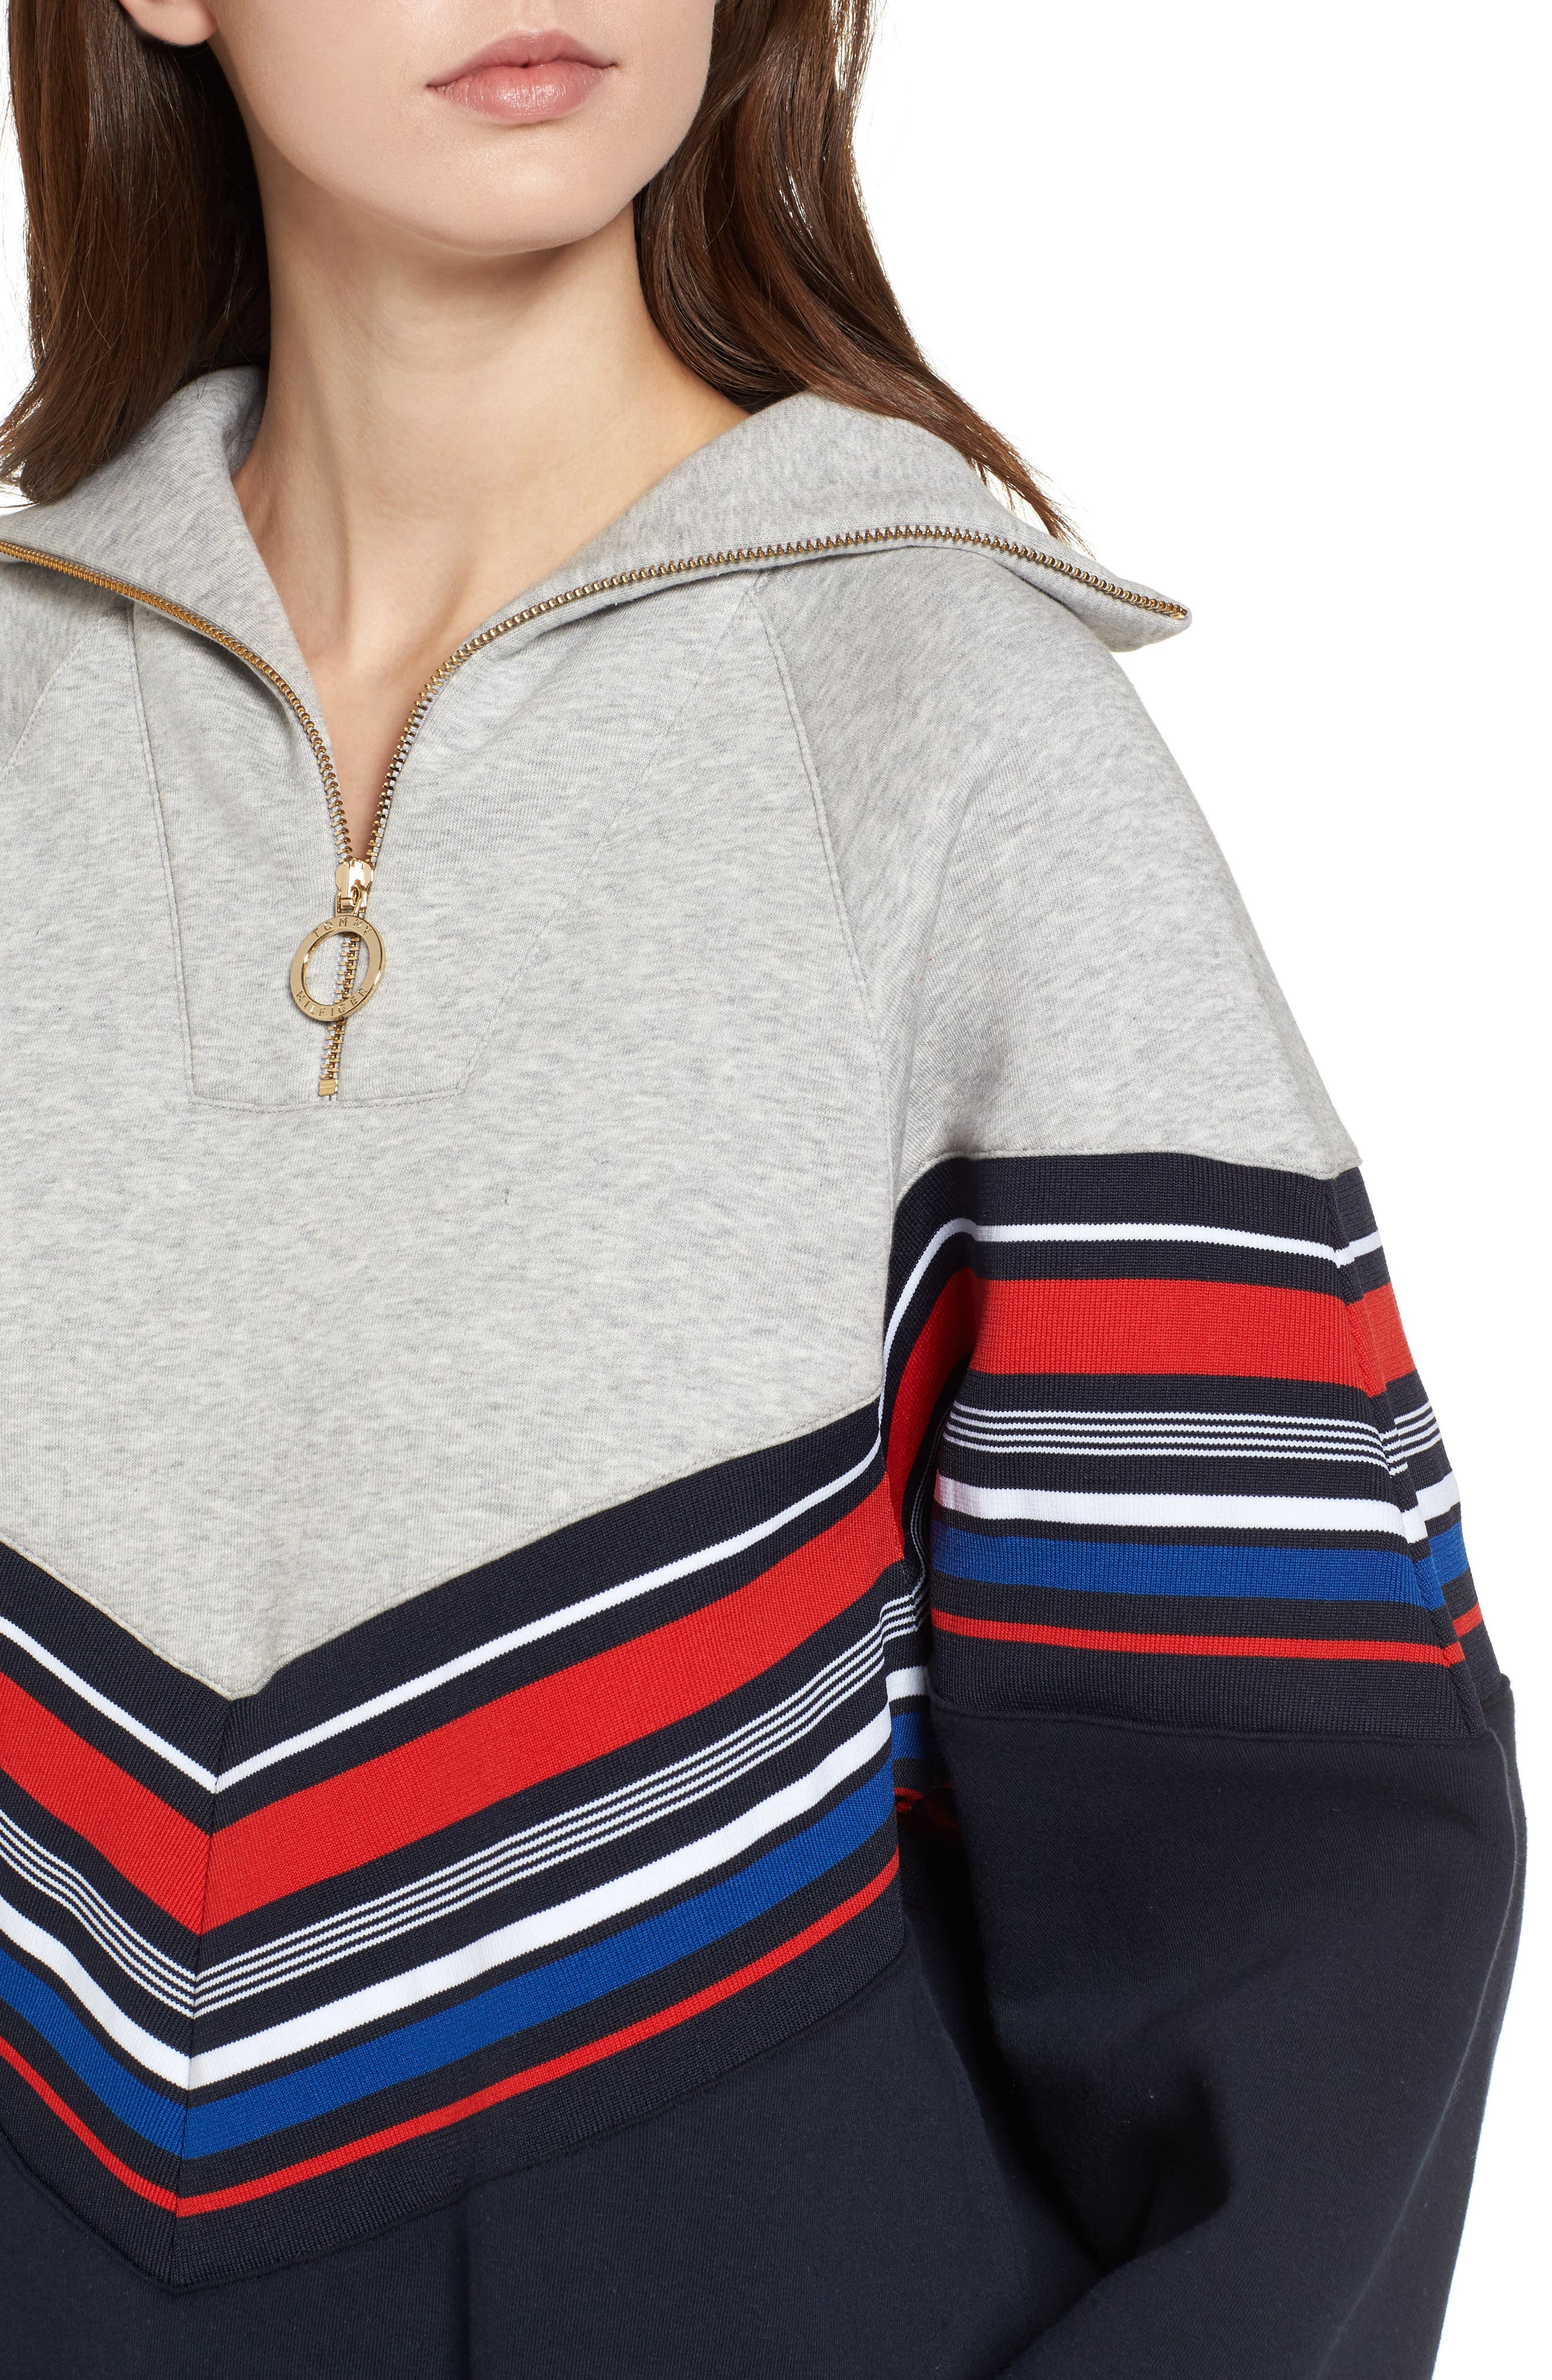 x Gigi Hadid Racing Sweatshirt Dress,                             Alternate thumbnail 4, color,                             Midnight/ Hthr